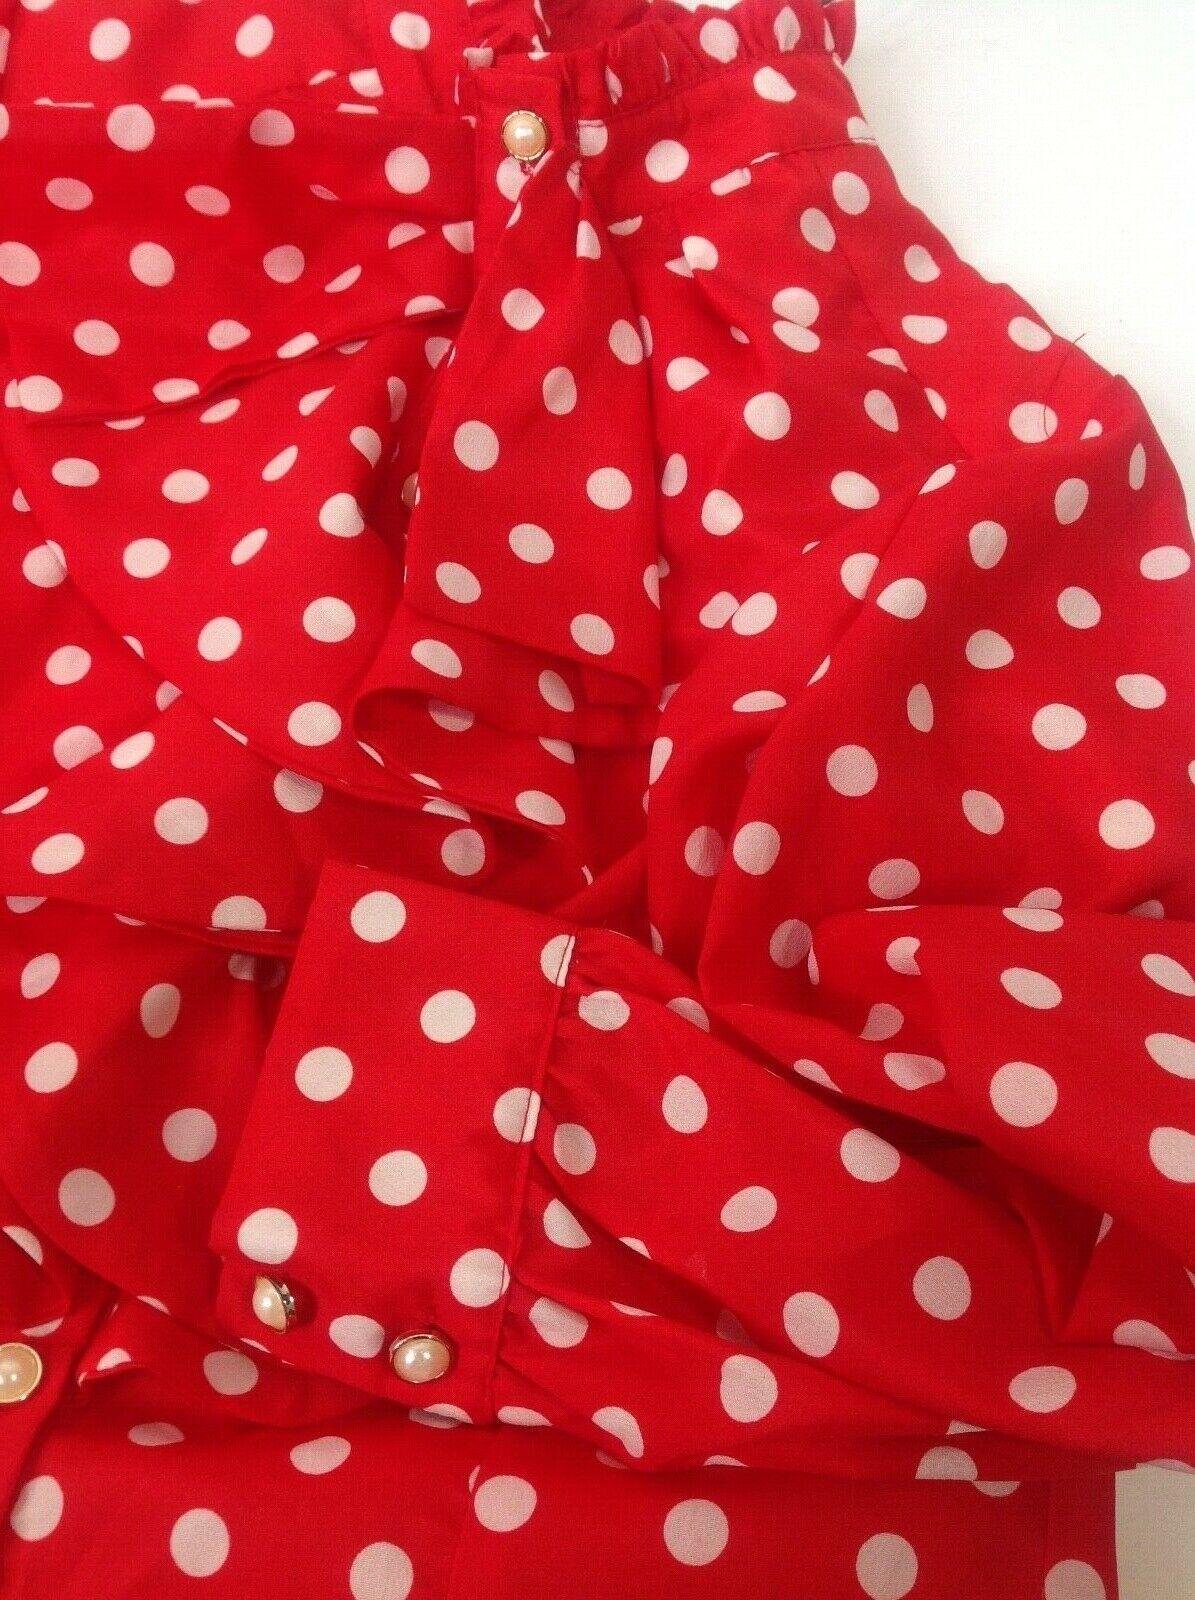 Vintage Red White Polka Dot High Neck Ruffle Blou… - image 6